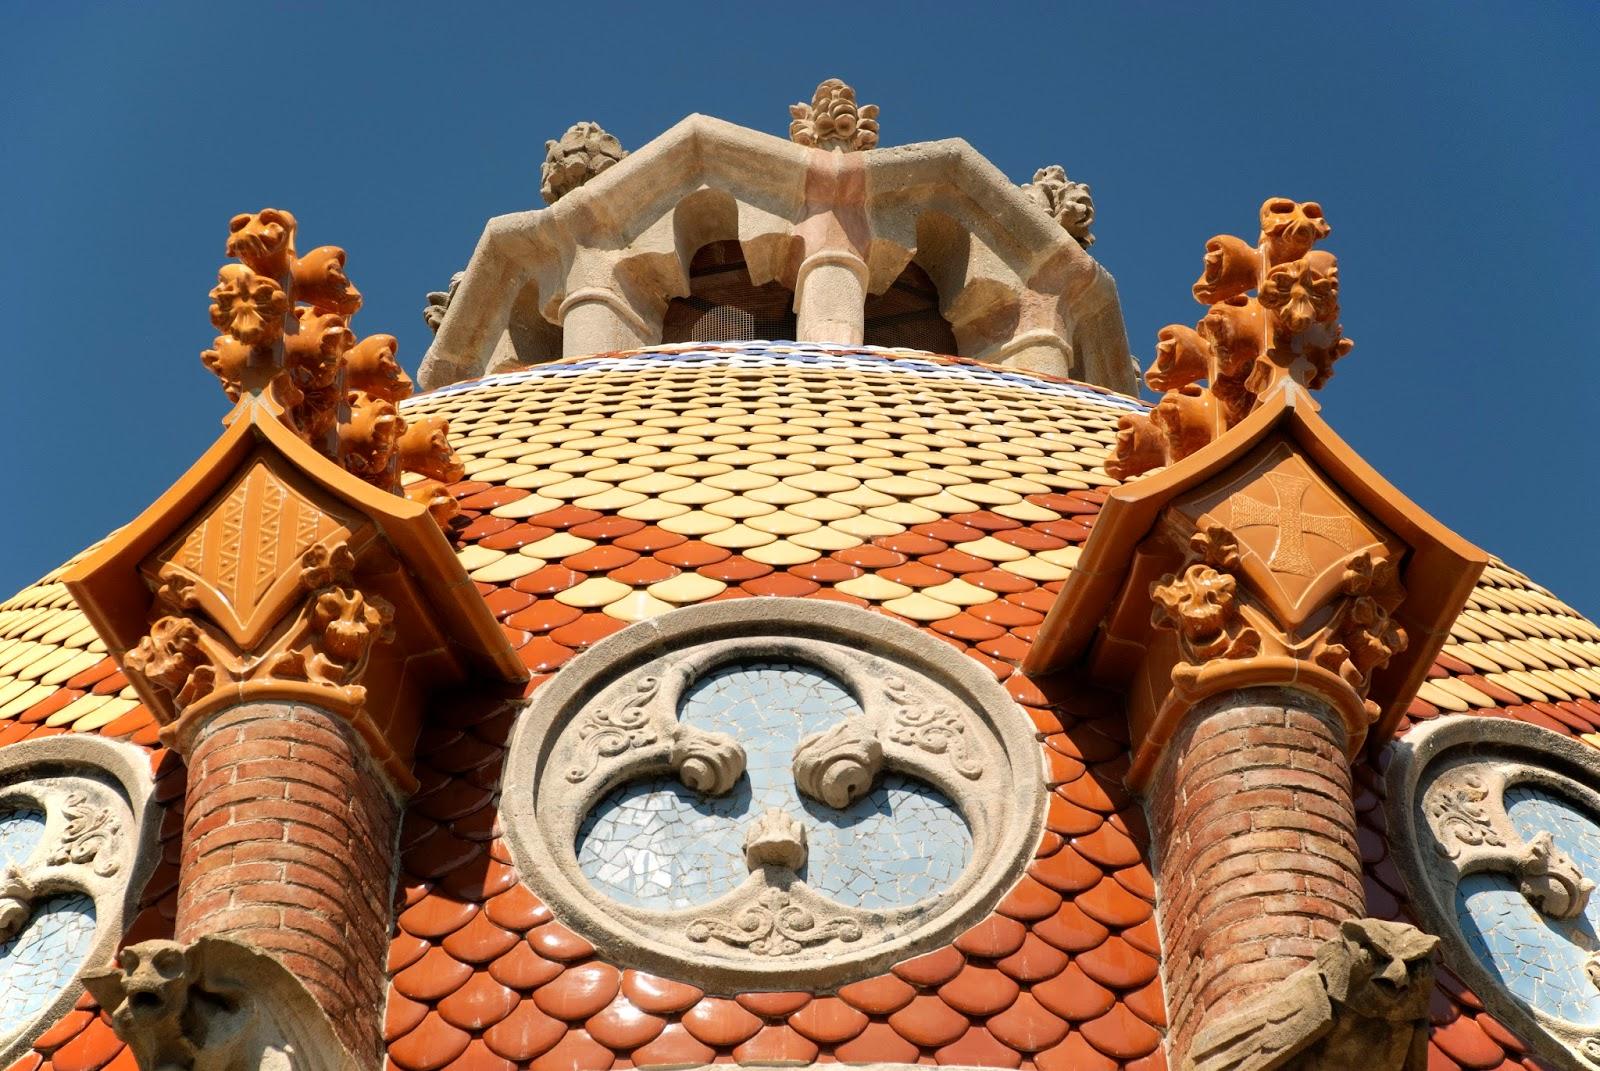 Desain-Desain Arsitektur Ibukota Terunik dan Spektakuler